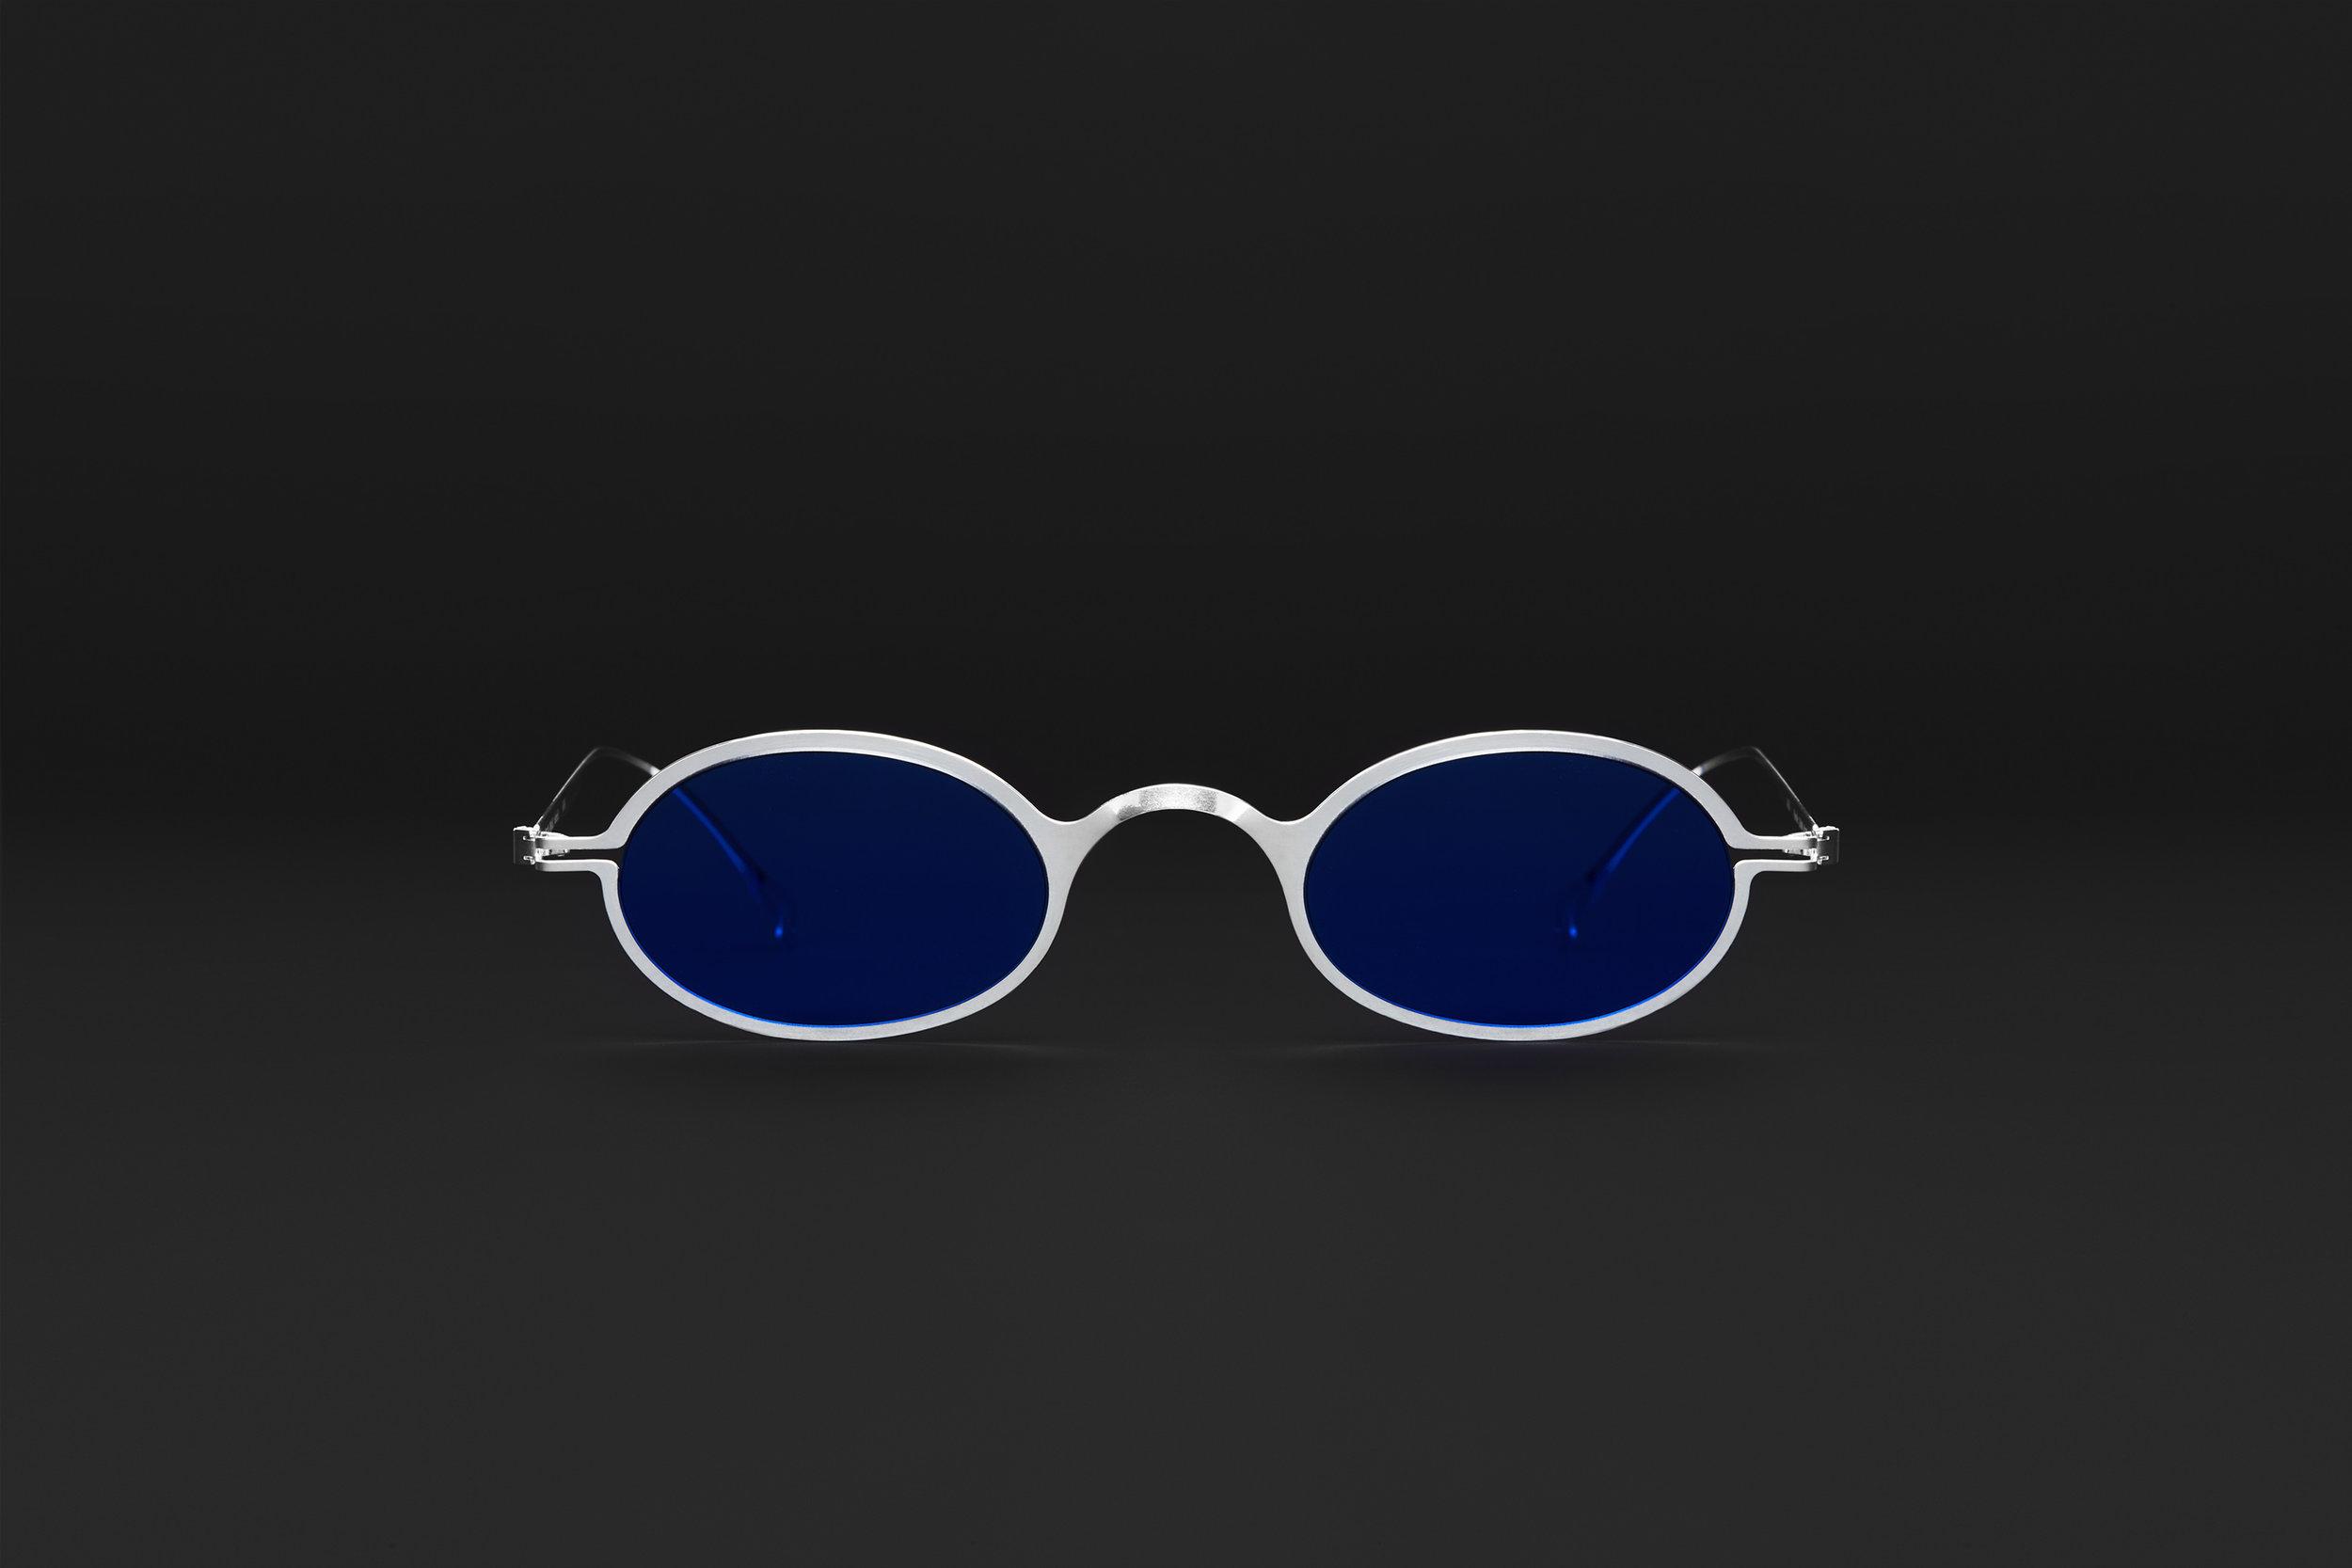 haffmans_neumeister_absinthe_argentum_litmus_blue_phasmid_sunglasses_front_102221.jpg